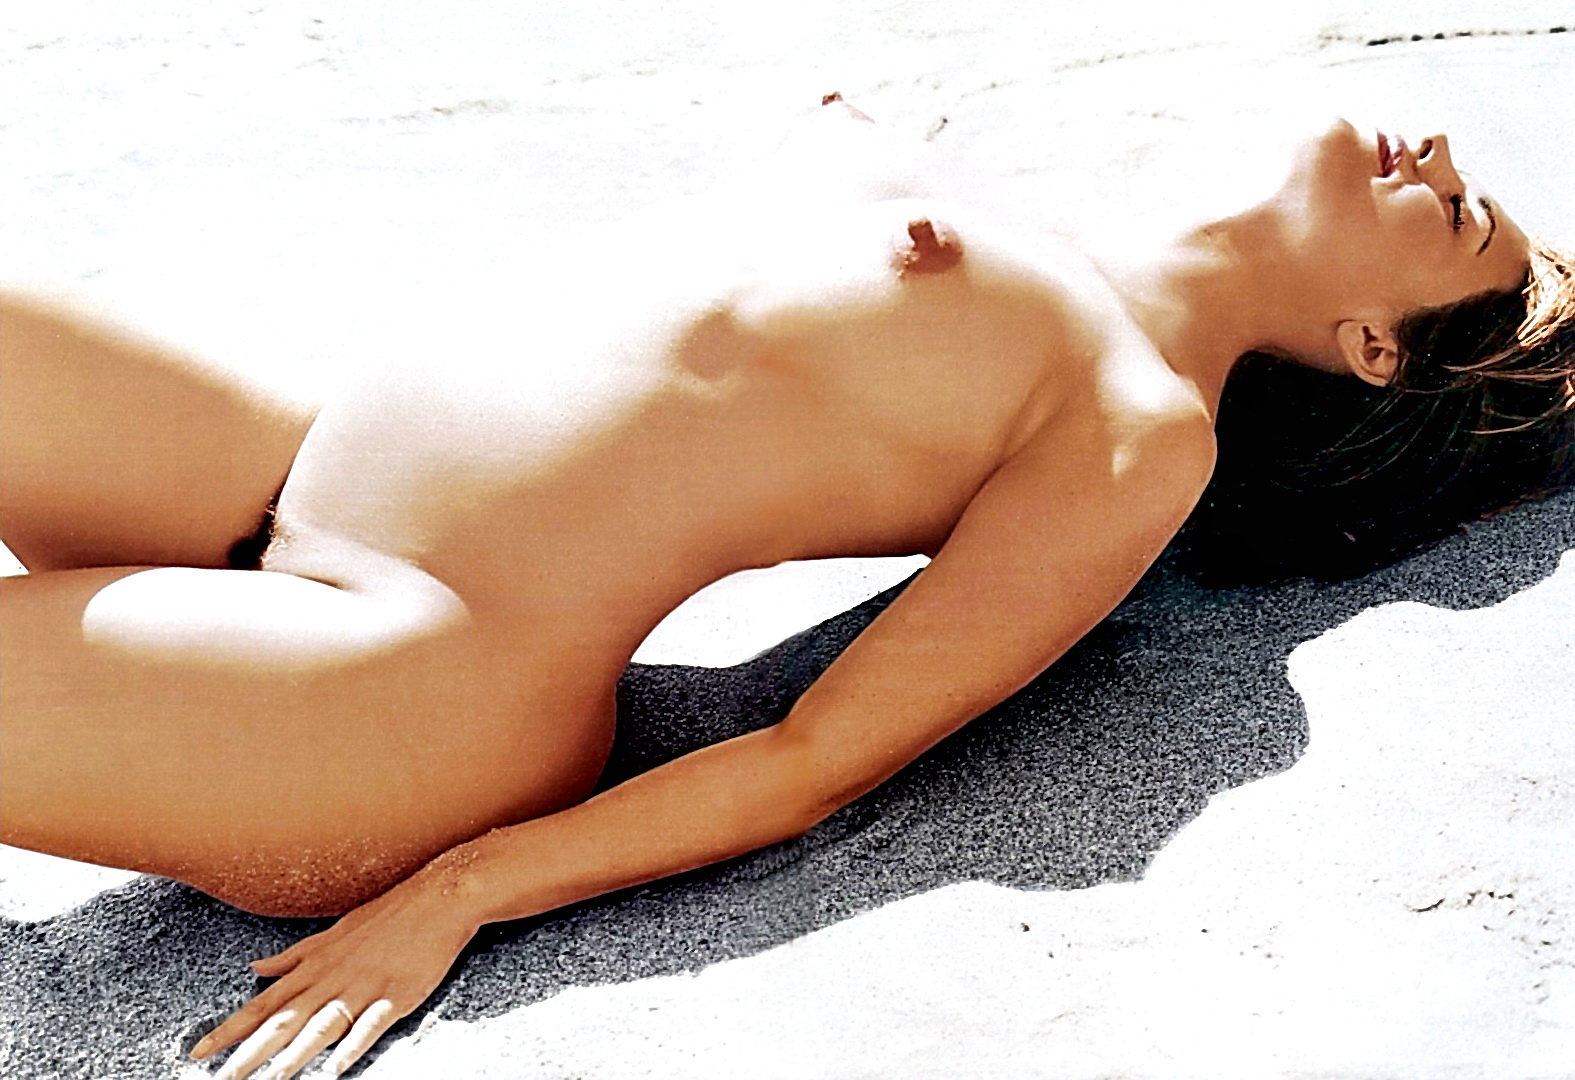 lisa-rinna-nude-playboy-photos